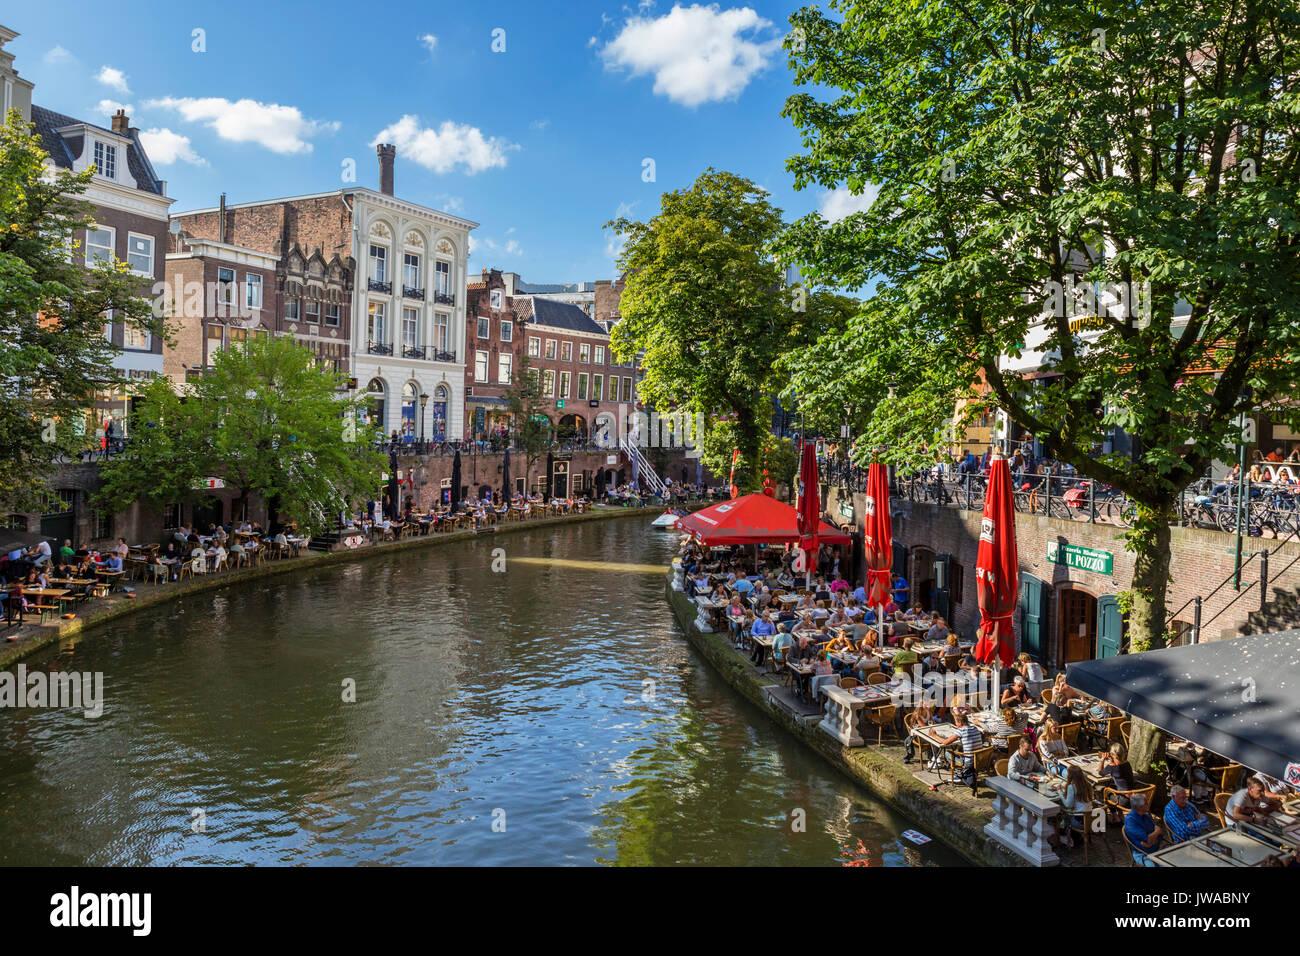 Restaurant alongside the Oudegracht (Old Canal), Utrecht, Netherlands Stock Photo